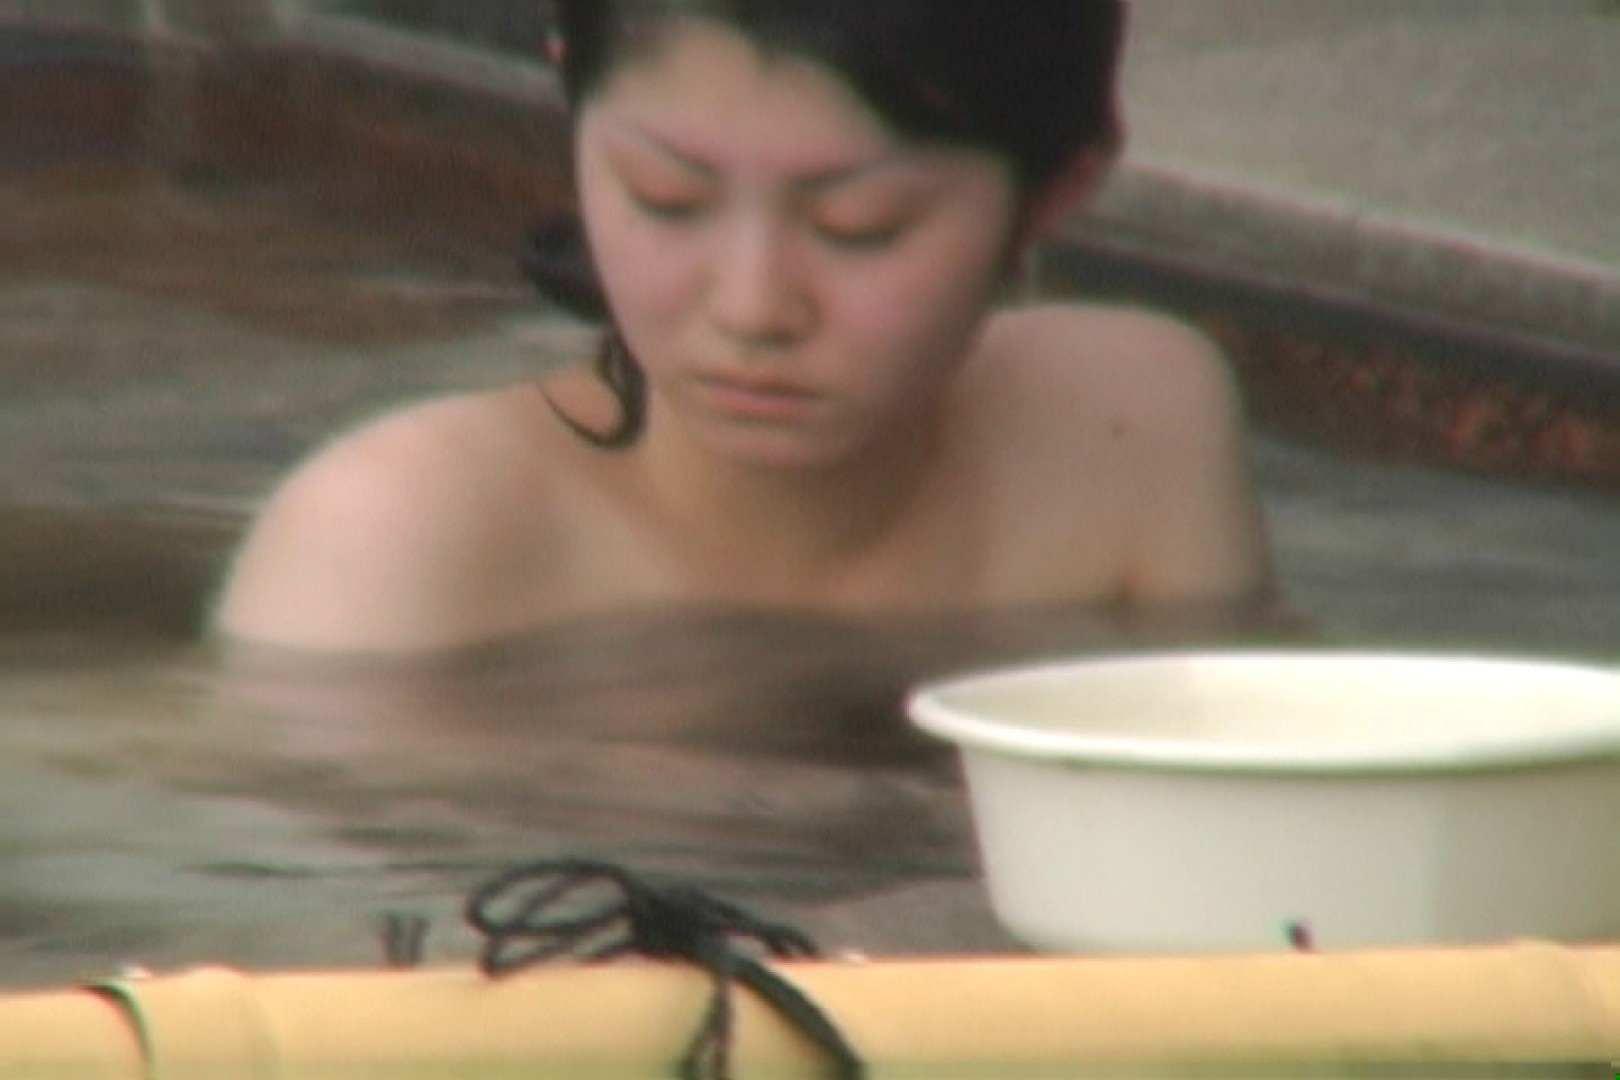 Aquaな露天風呂Vol.579 盗撮 | HなOL  53pic 26